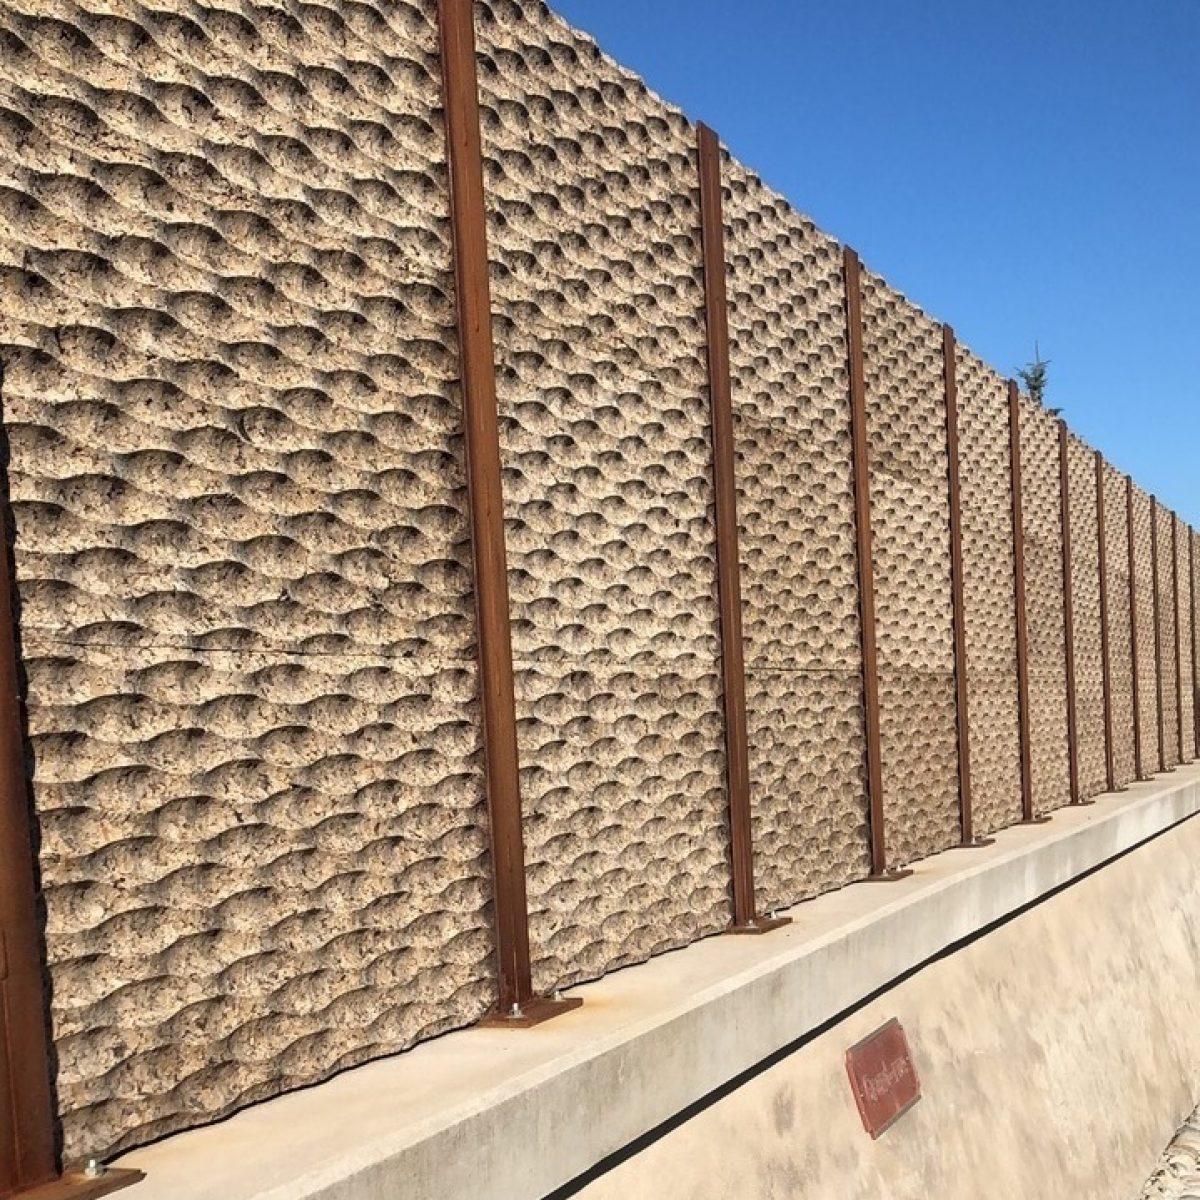 Barriere liege vague 3